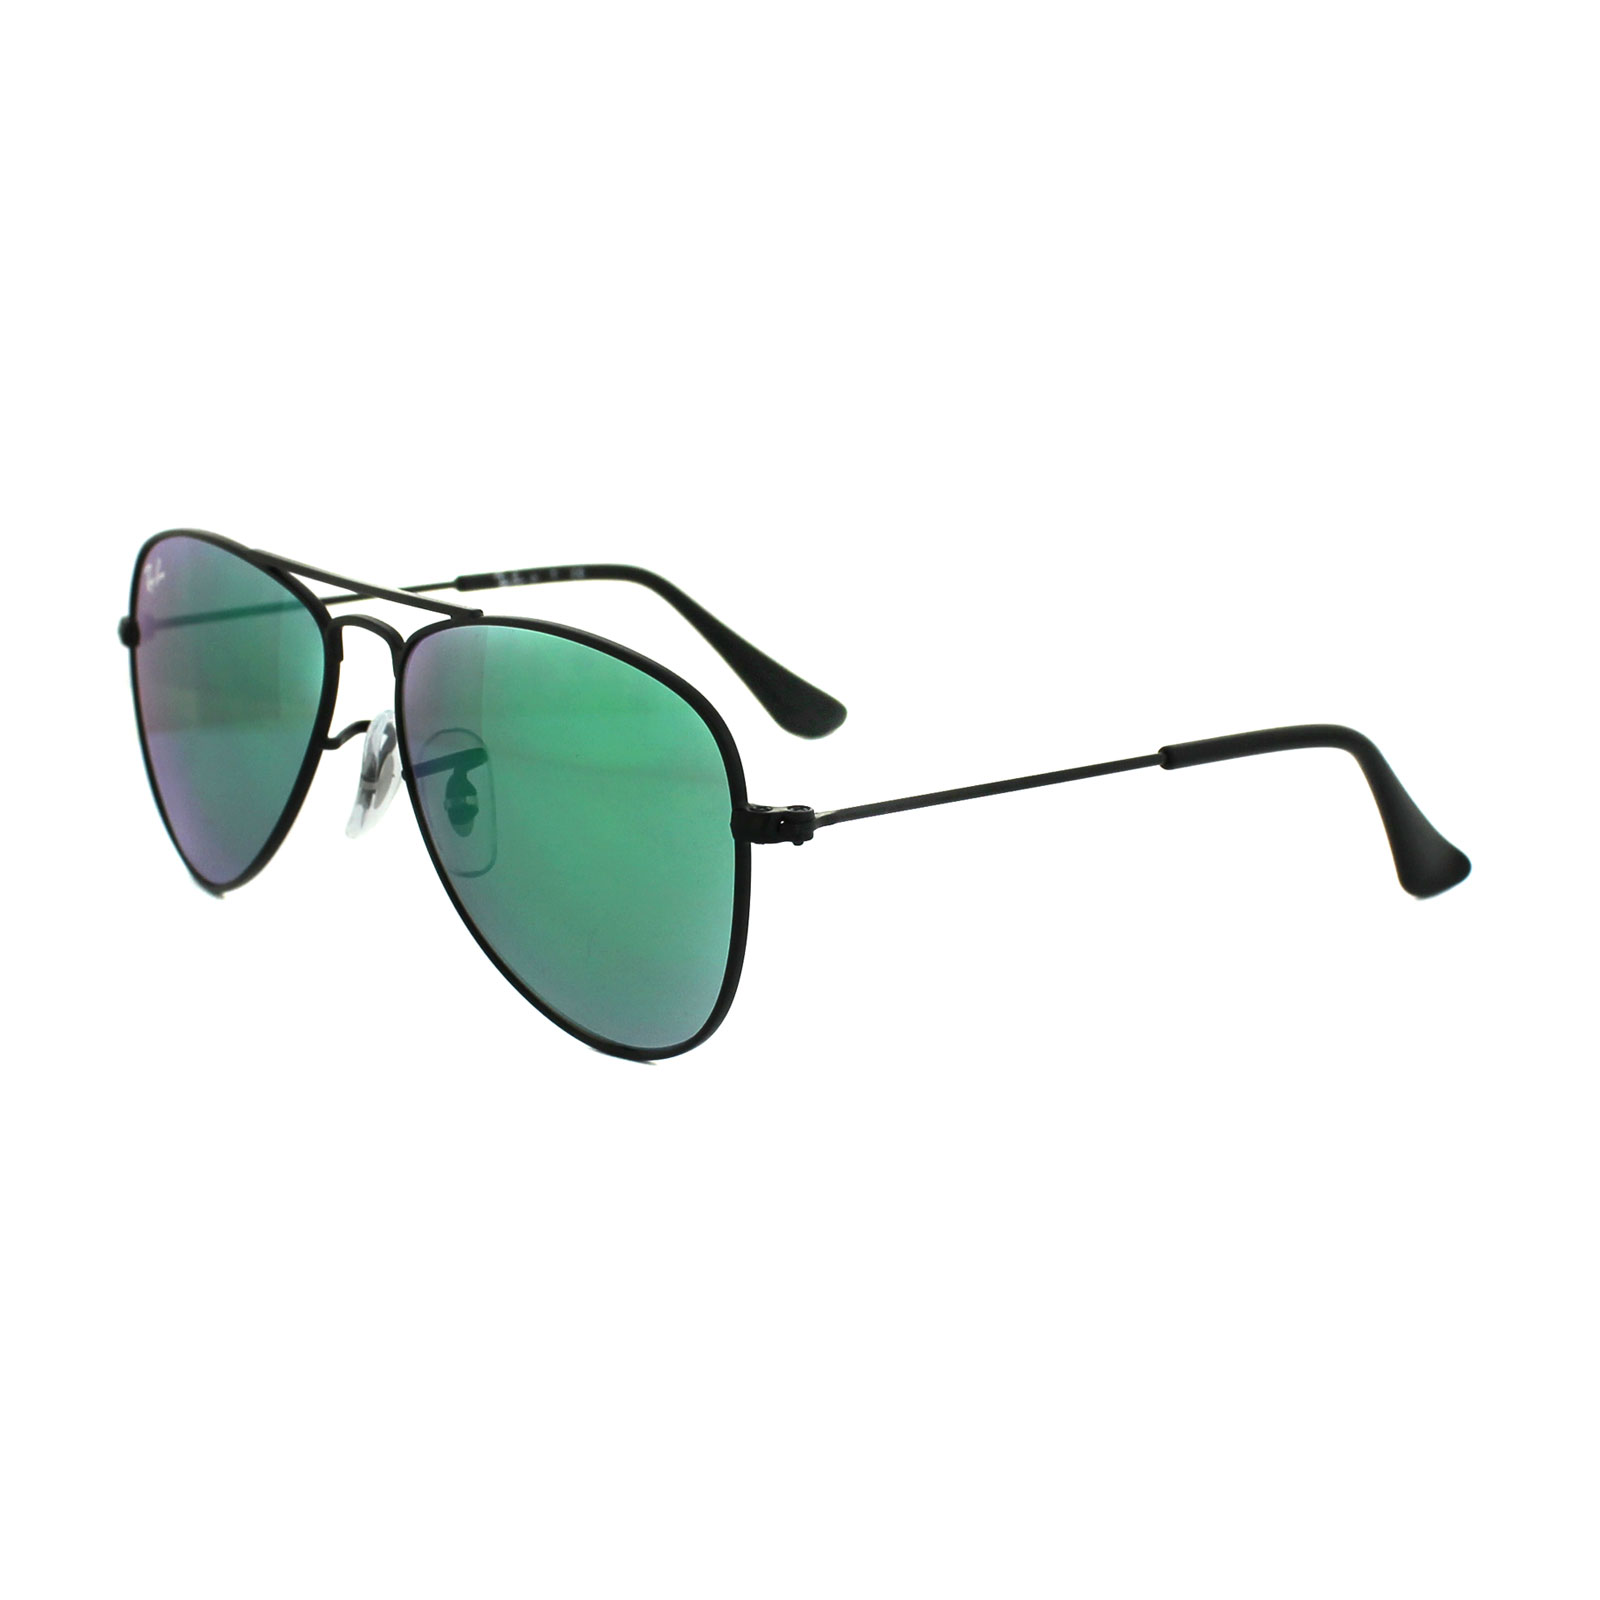 0d2c8795d6a kids ray ban prescription glasses ray-ban sunglasses green flash ...